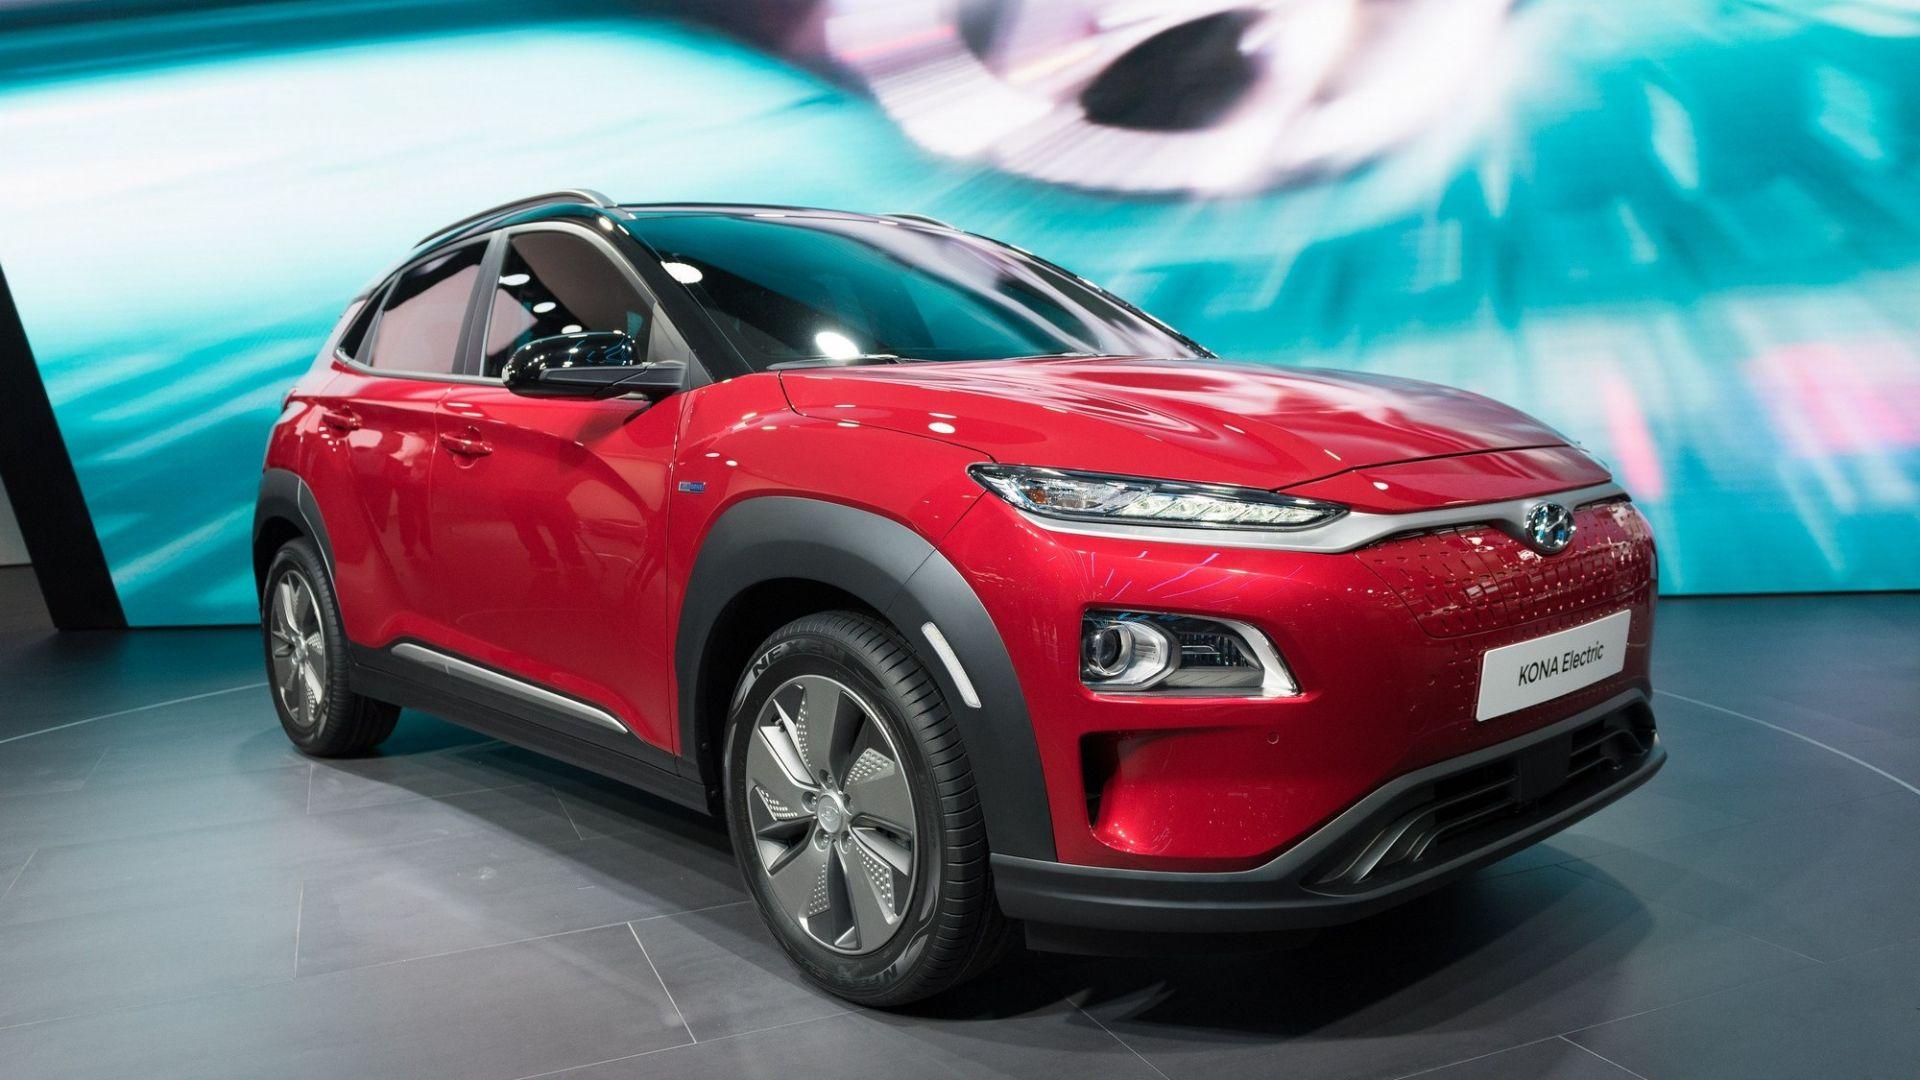 Seat Suv Ateca >> 10 novità SUV in arrivo dal Salone di Ginevra 2018 - MotorBox